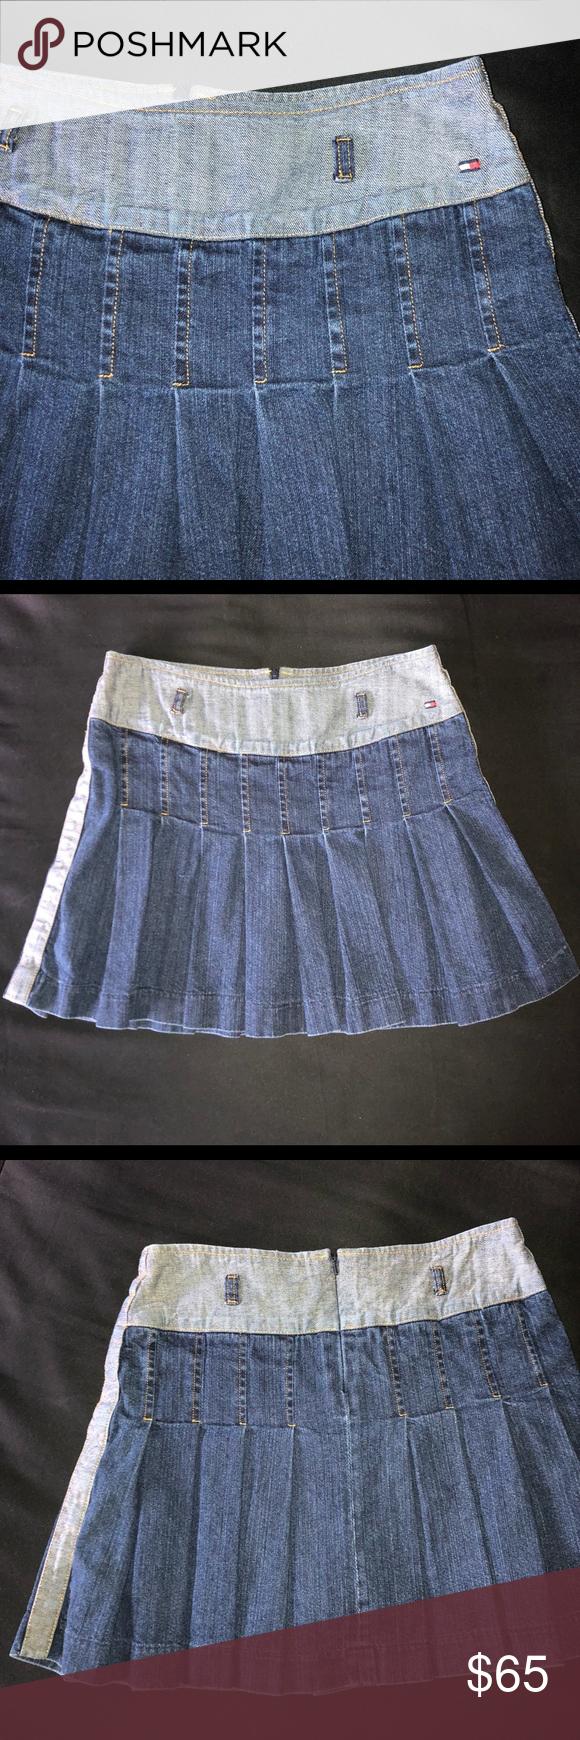 90's Tommy Hilfiger Vtg Jeans Size 28